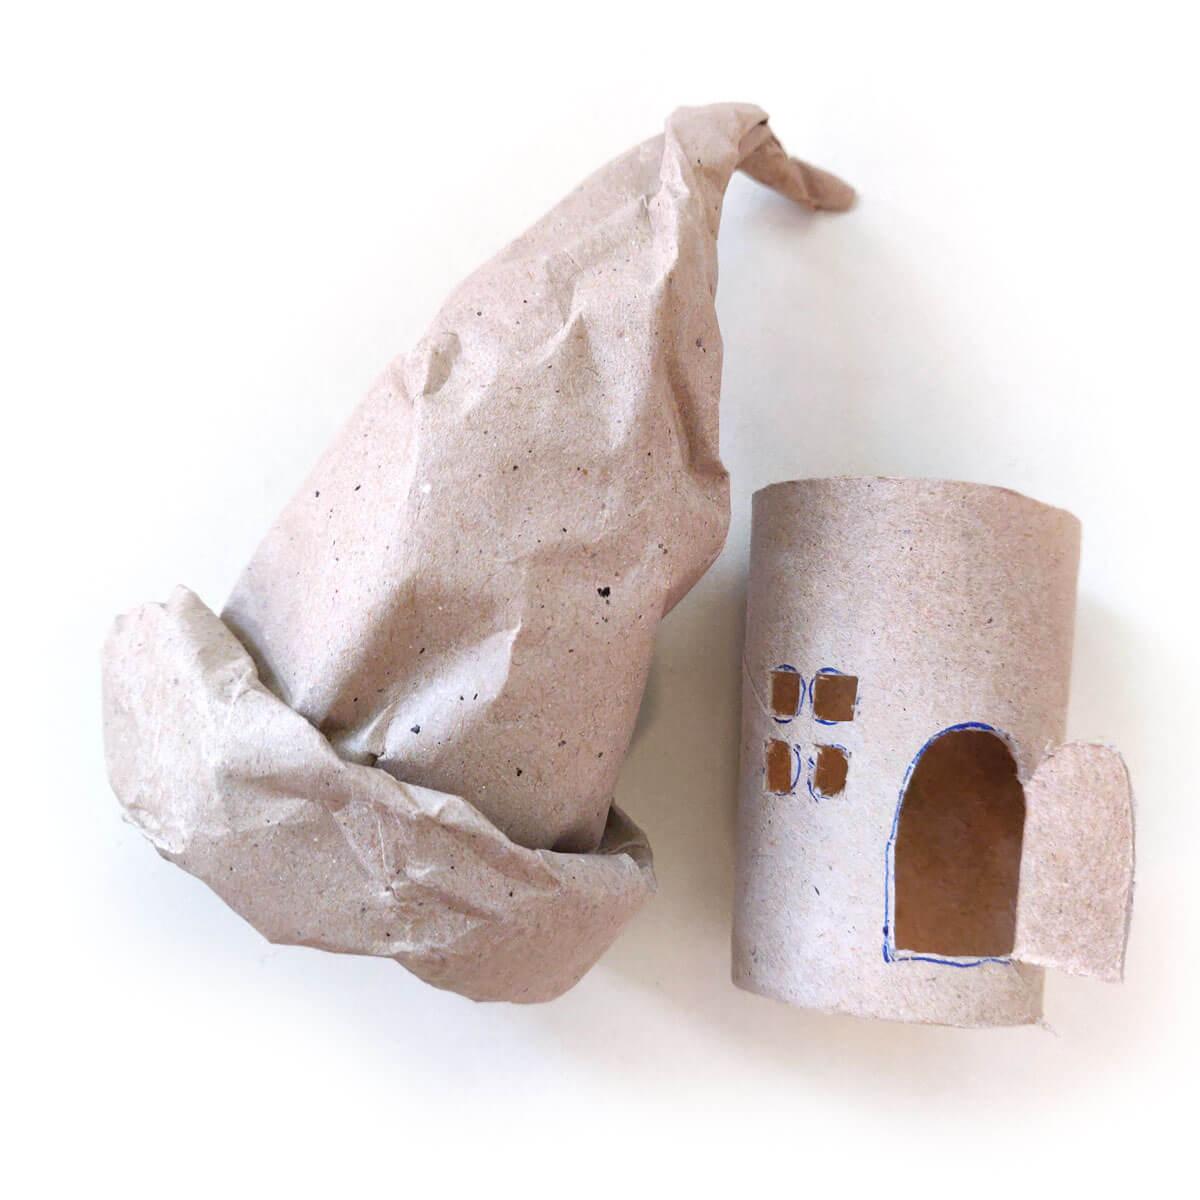 Märchenhaus aus Karton